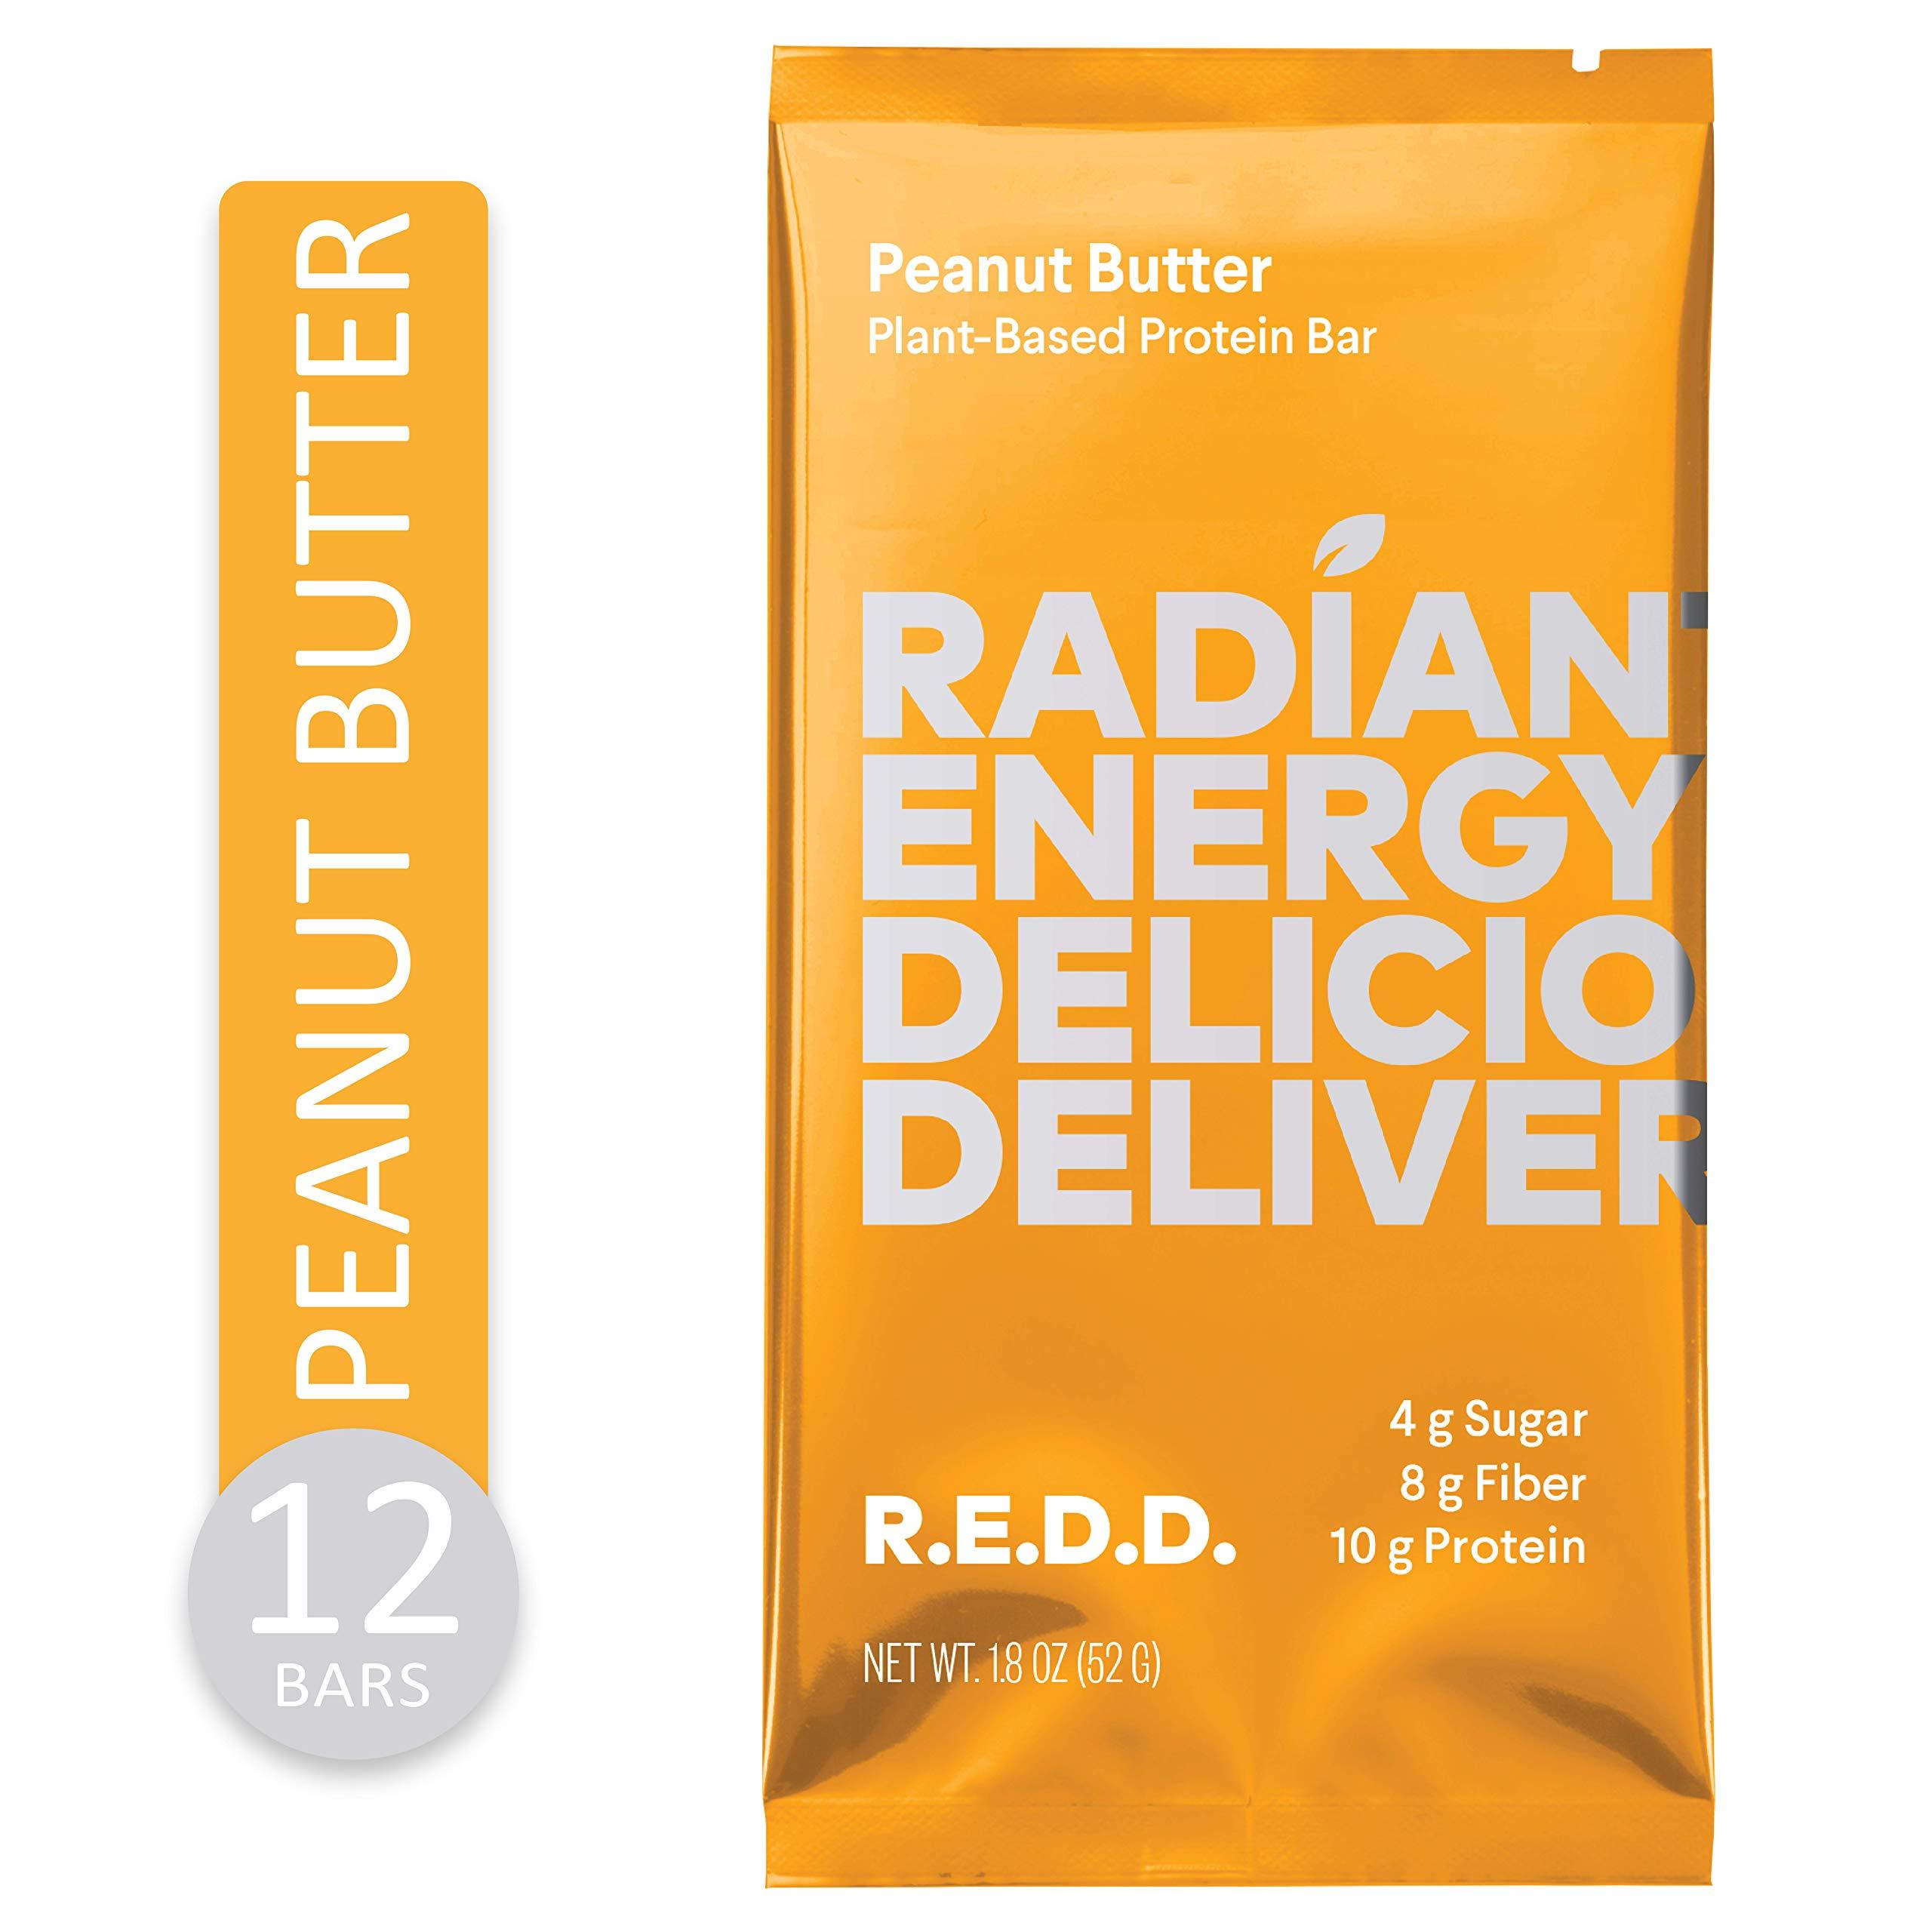 REDD Vegan Protein Bar - Peanut Butter - 12 Bars - Healthy Snack with 10g Plant-Based Protein, Low Sugar, Gluten-Free, Dairy-Free, High Fiber, Probiotics